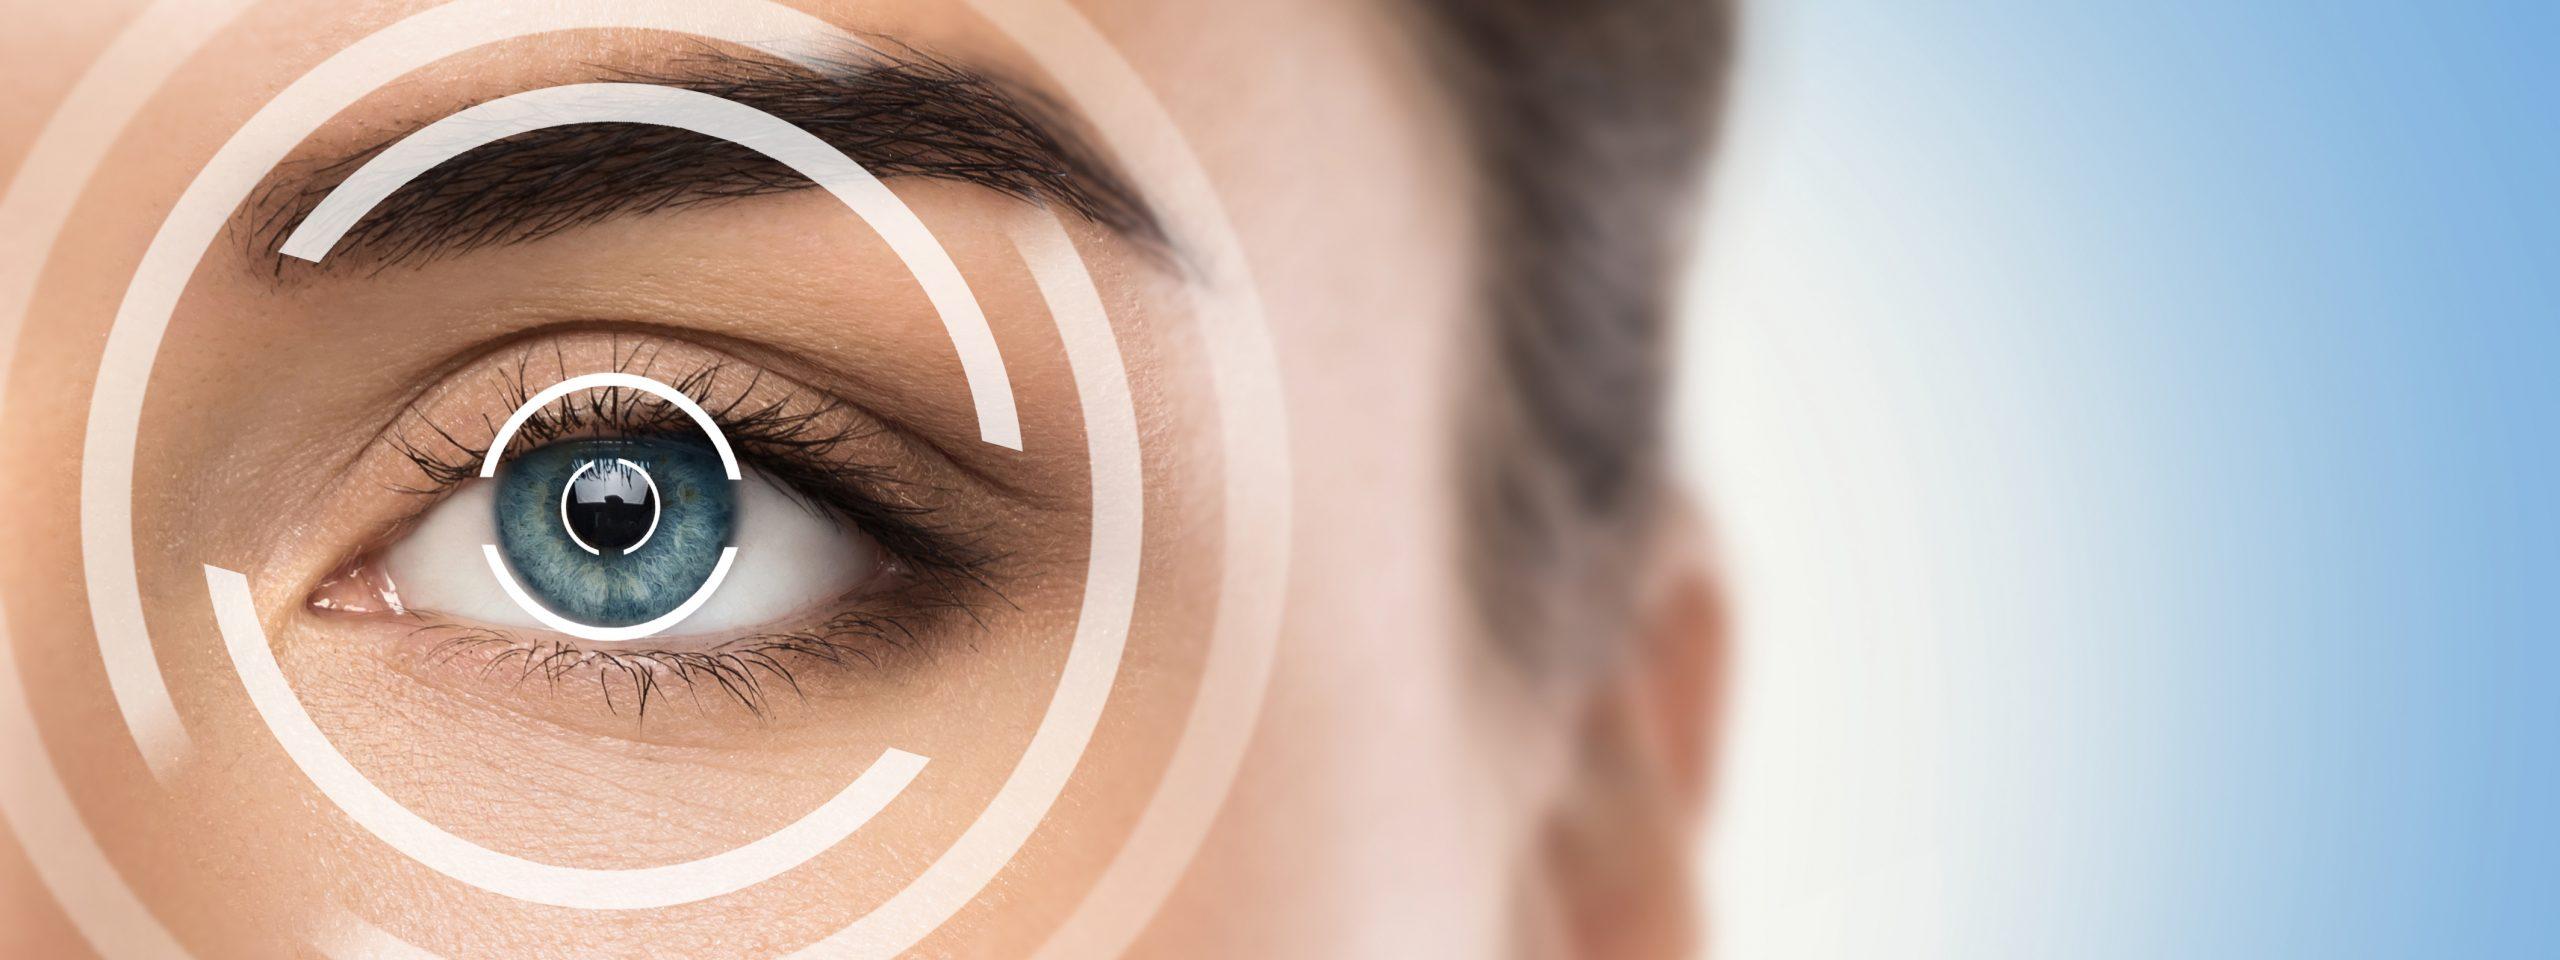 Graphic overlay of female eye